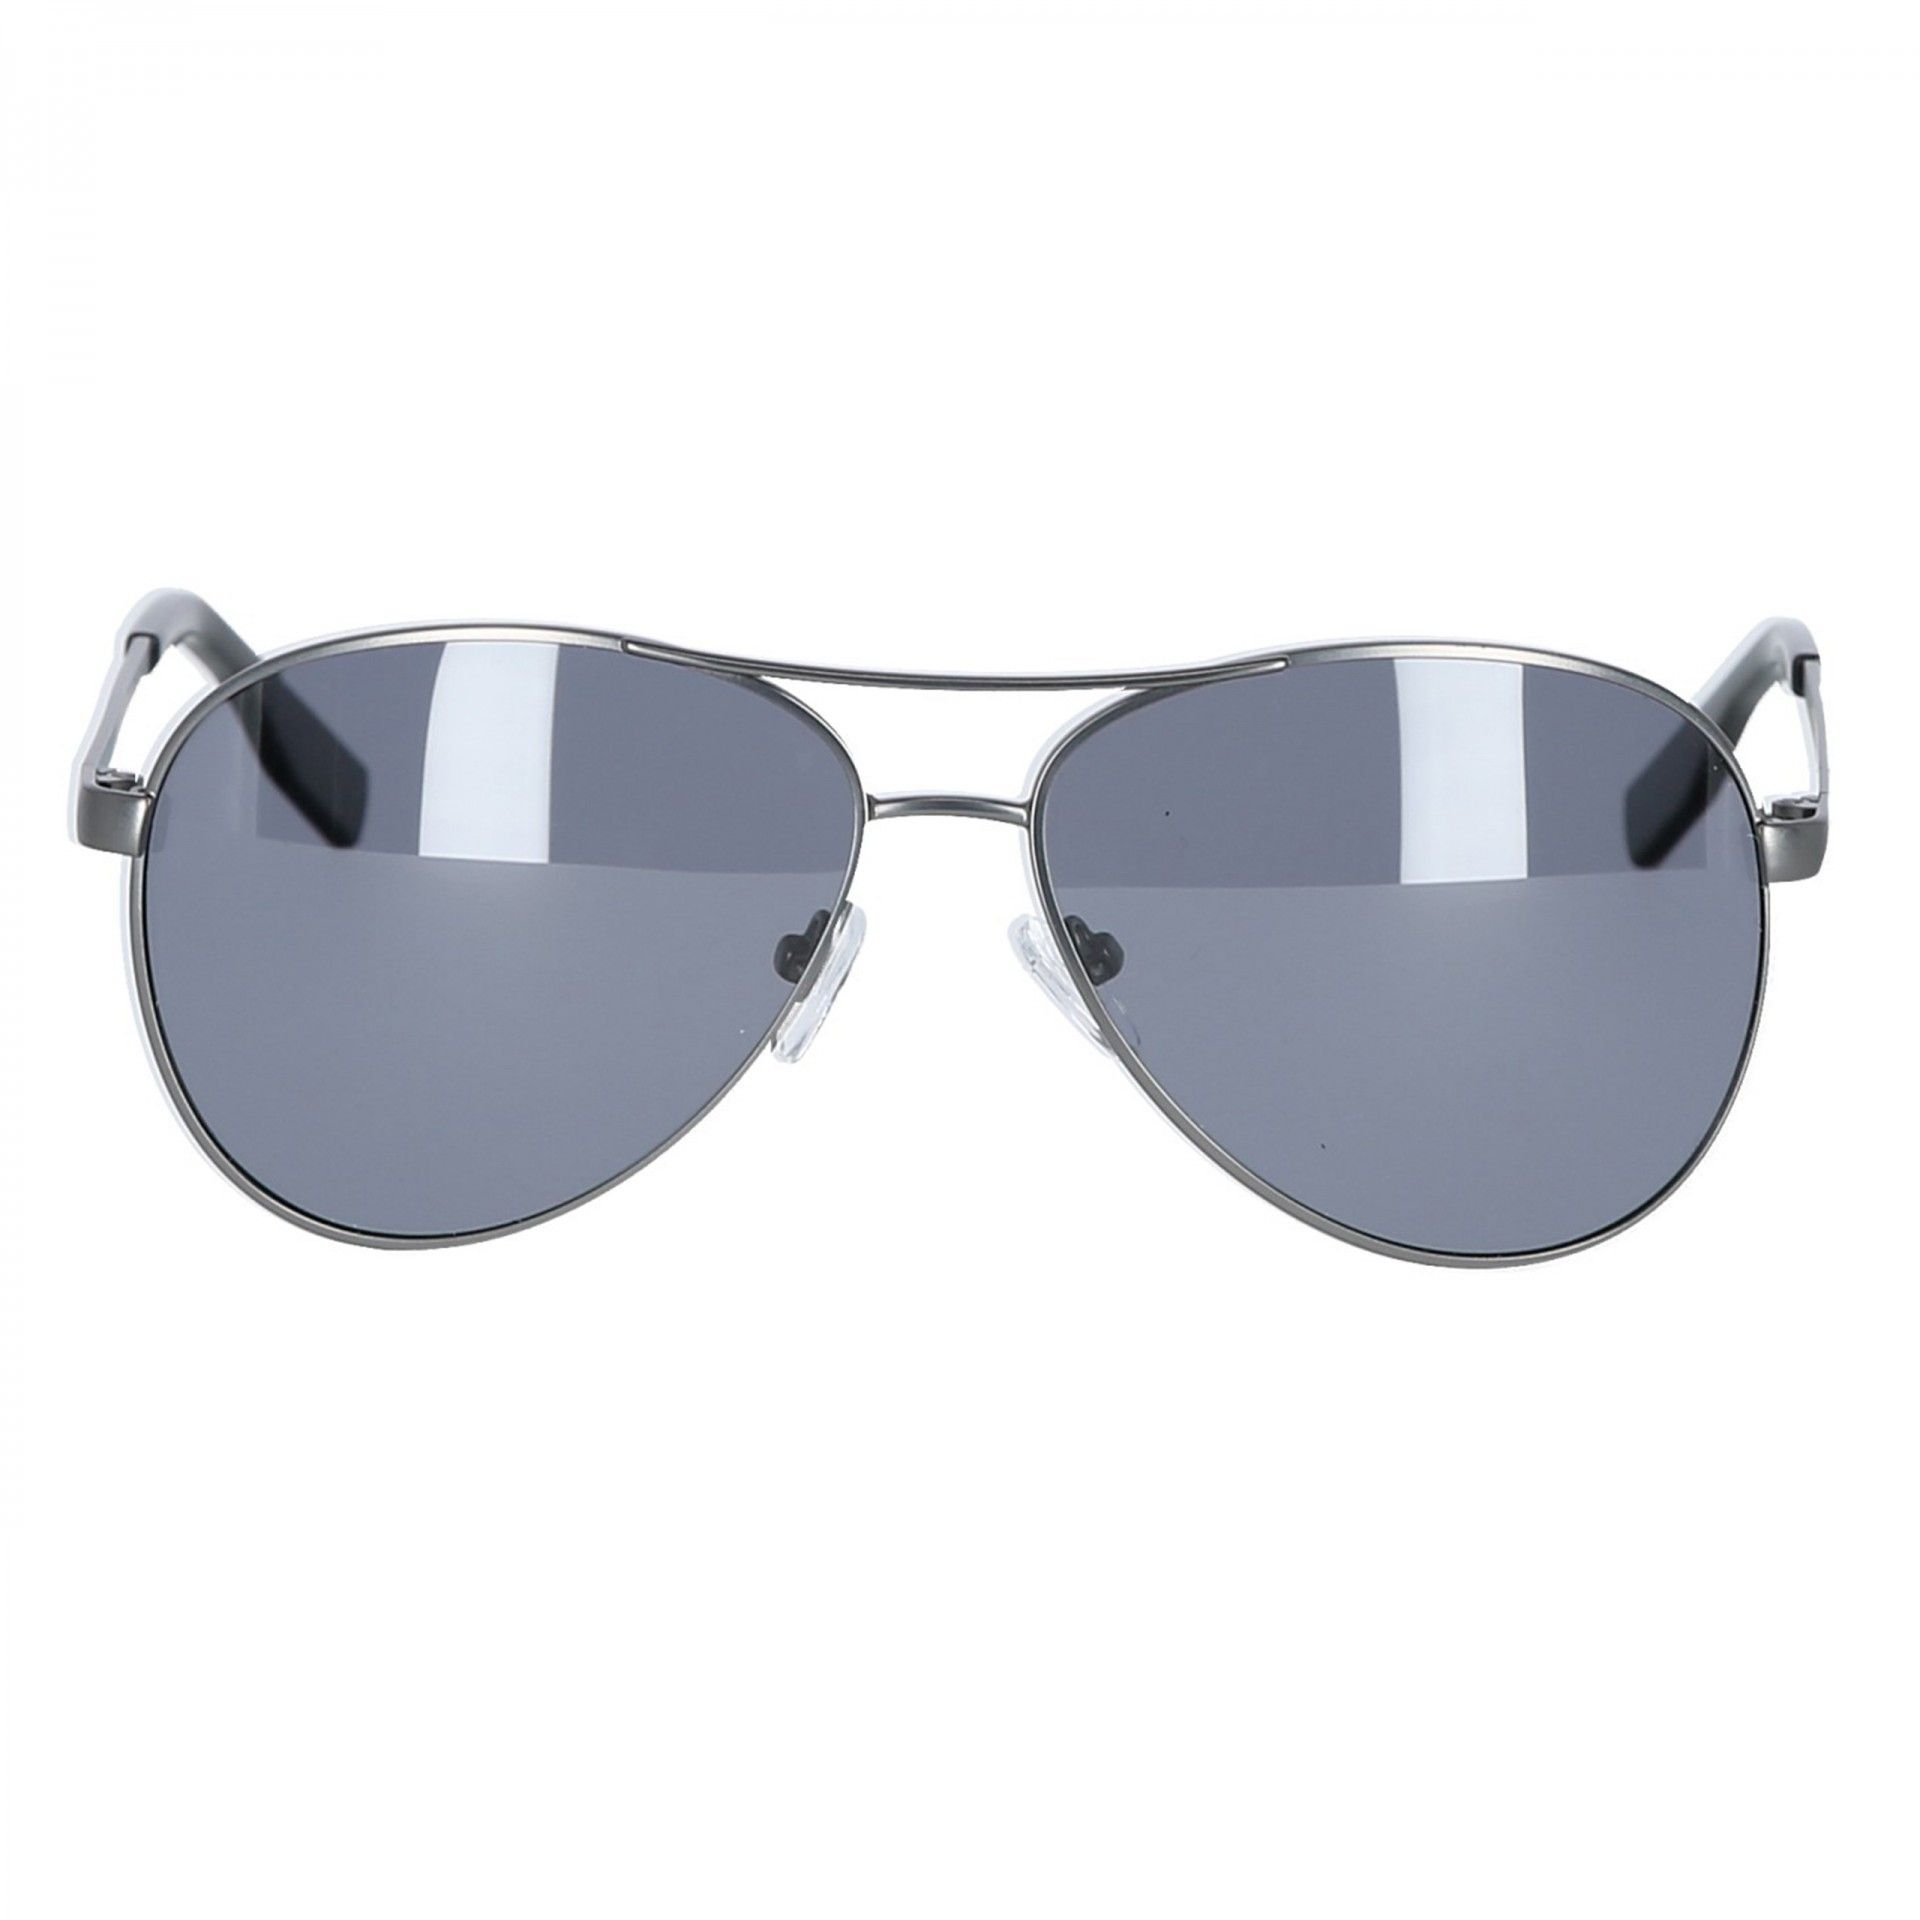 Trespass Unisex Adults Pilot Sunglasses